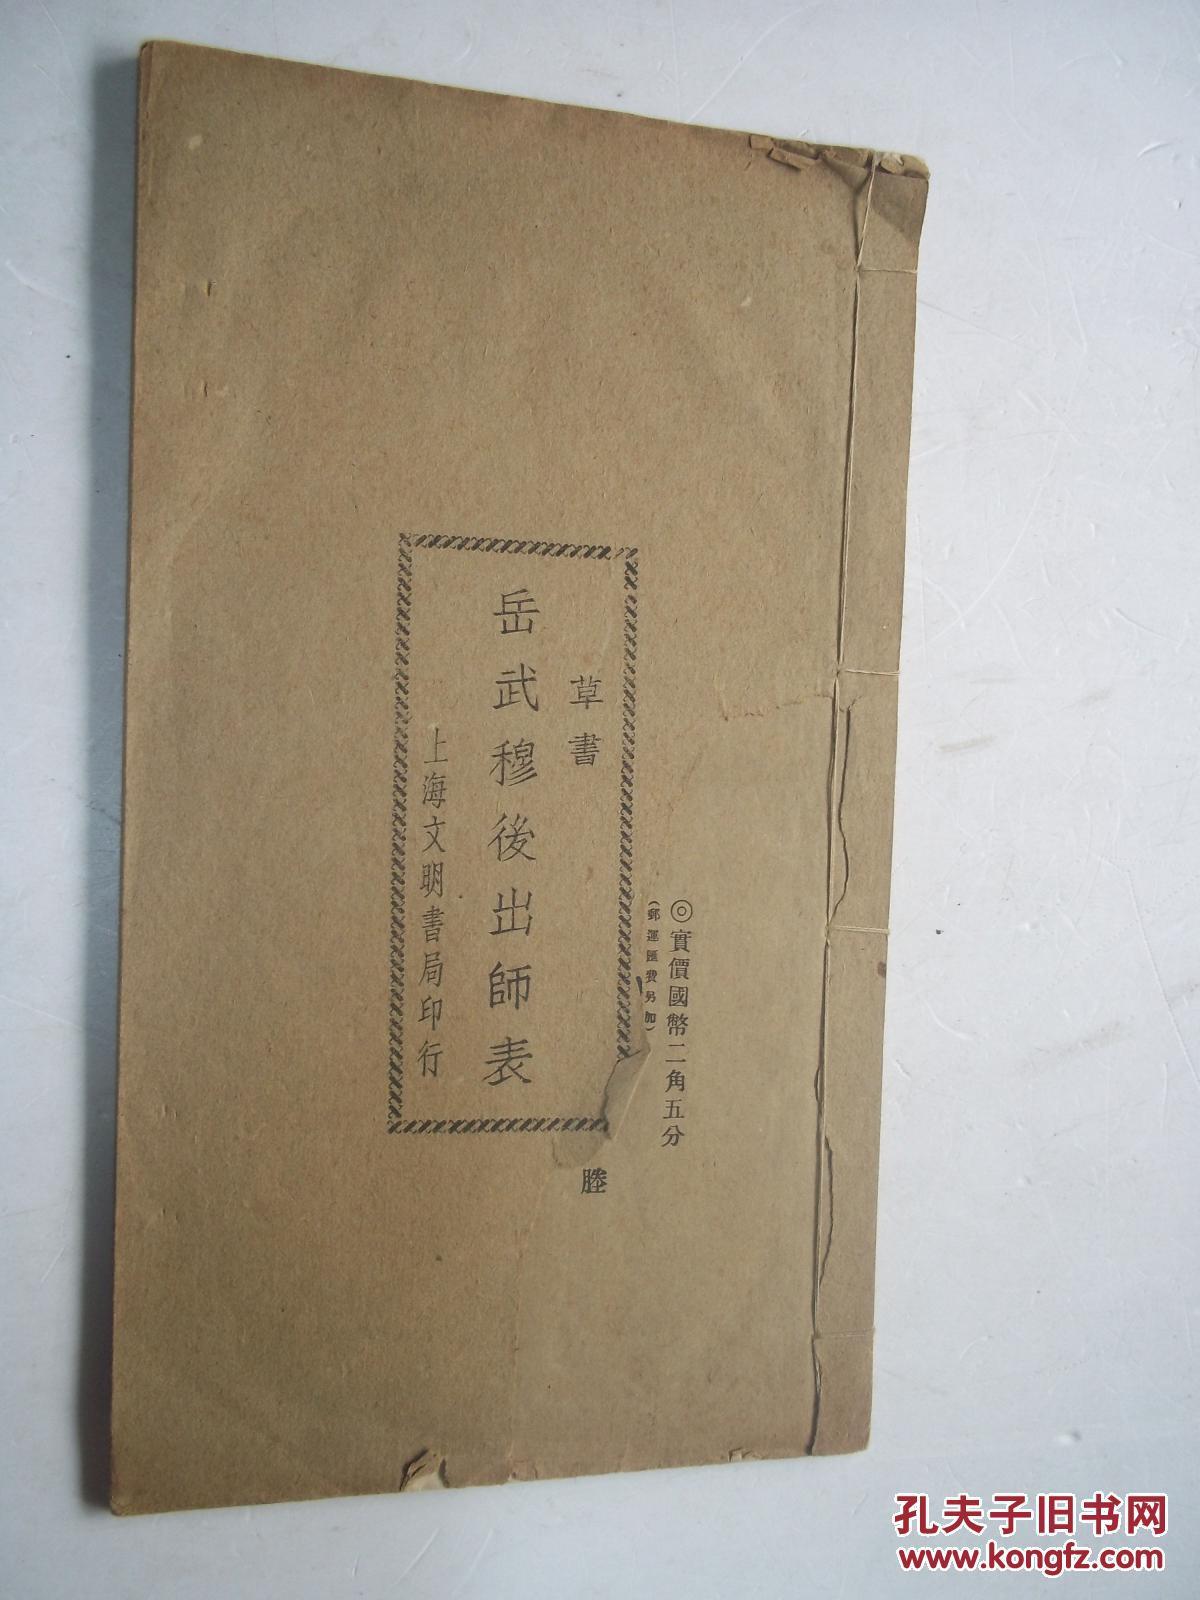 草书岳武穆后出师表 [E----15]